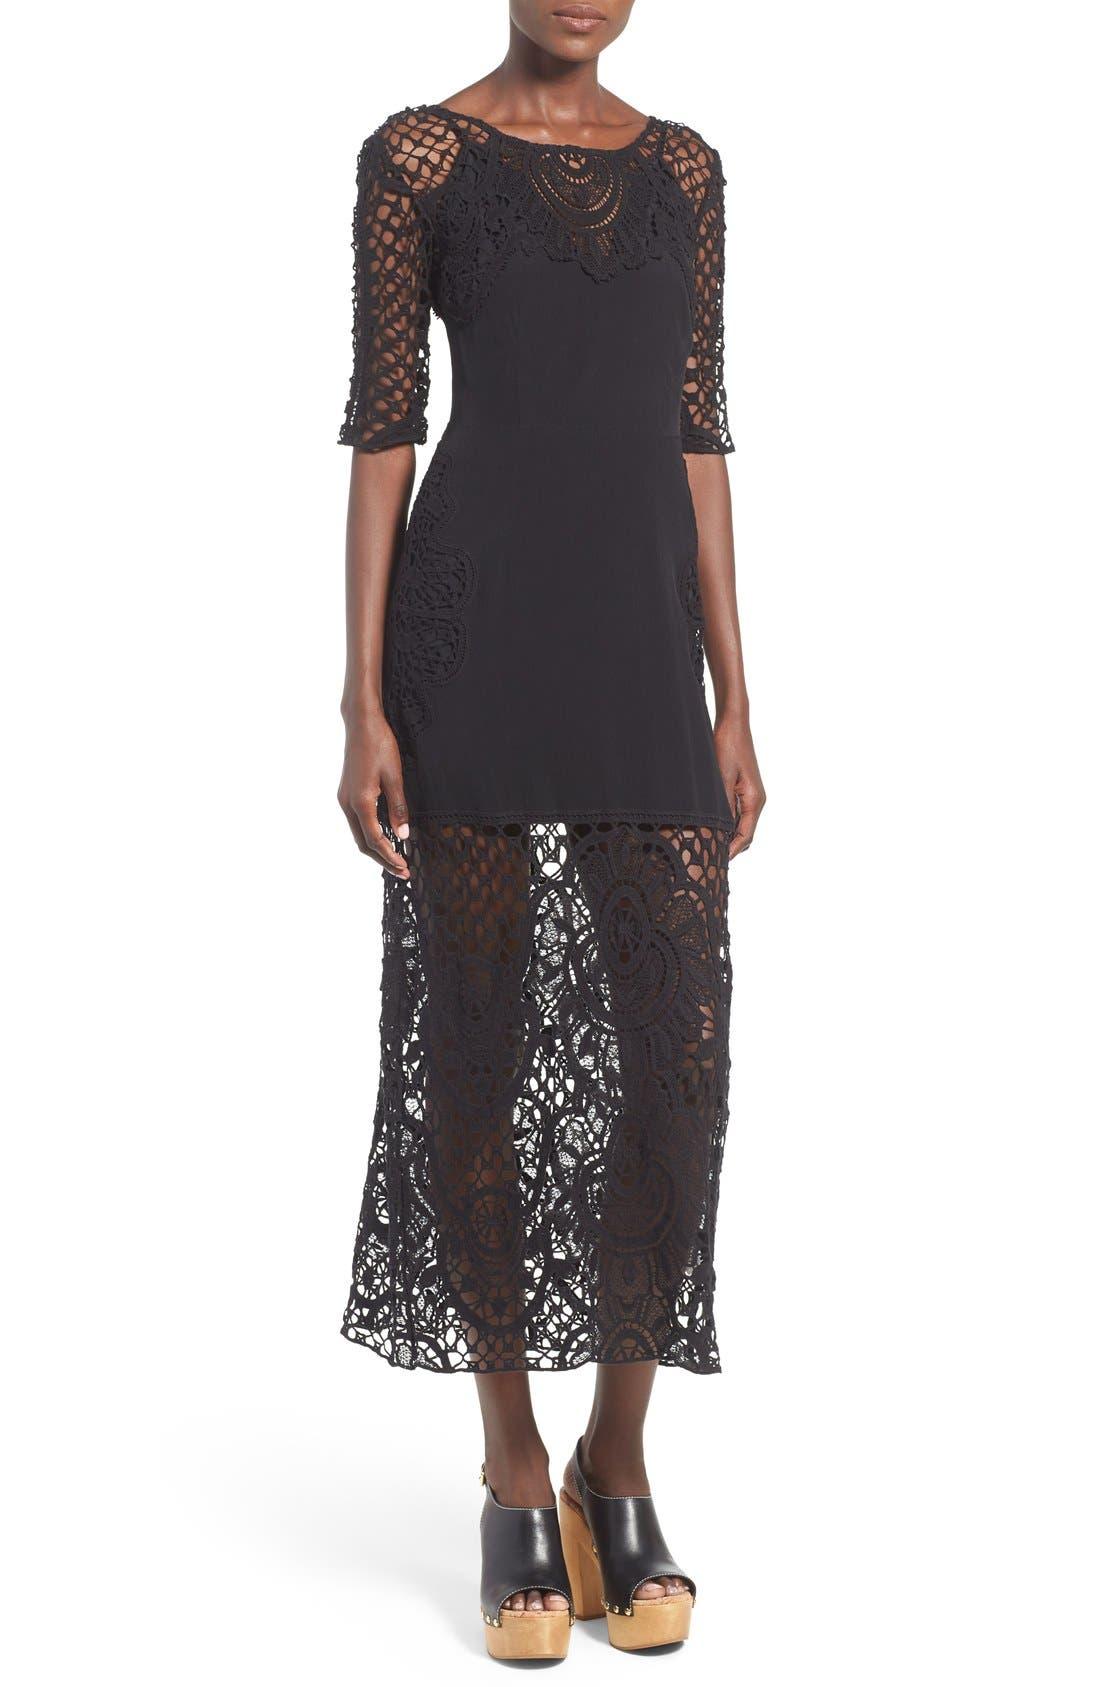 Main Image - For Love & Lemons 'Gracey' Illusion Lace Midi Dress